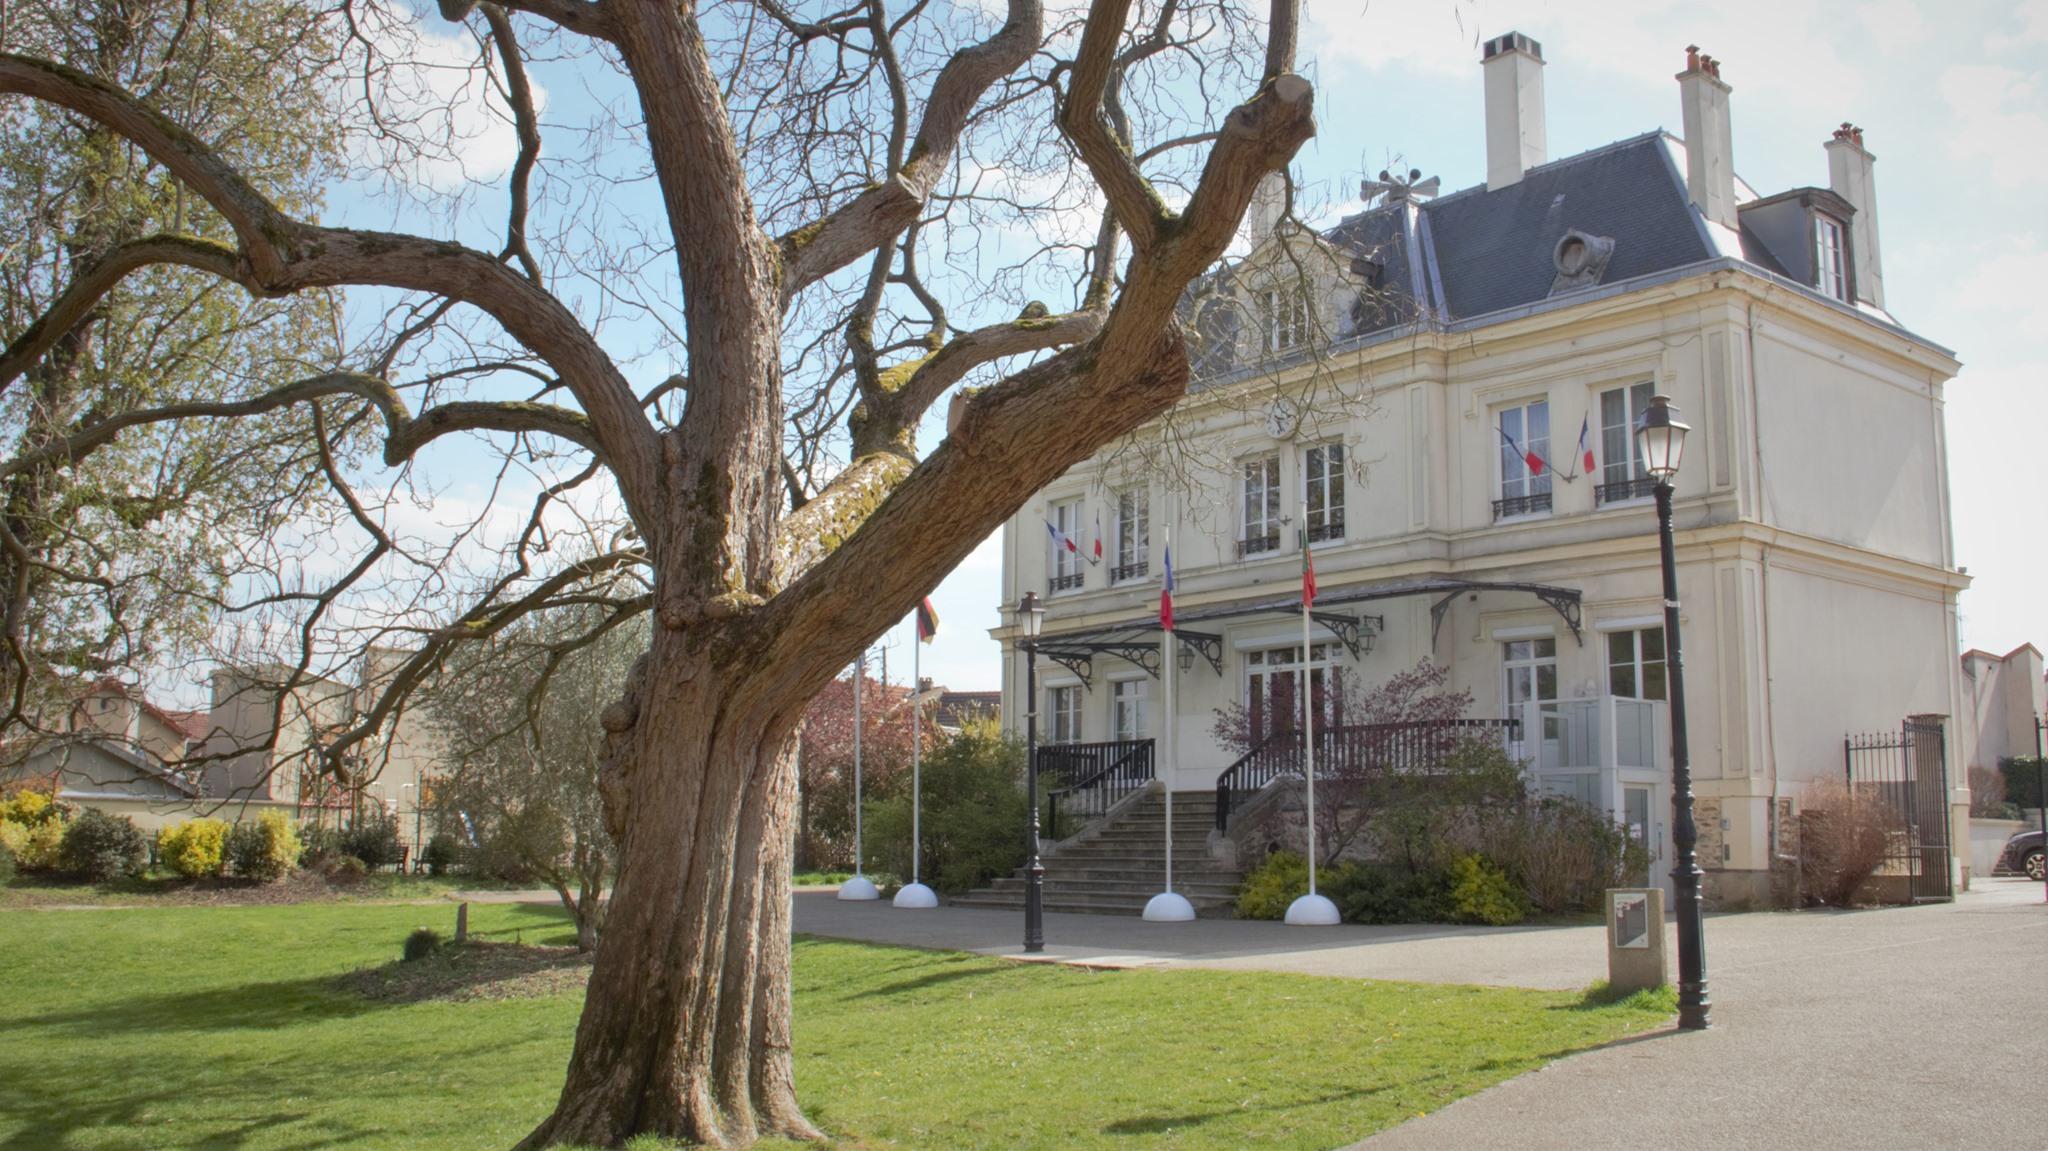 Mairie de Groslay (avril 2021 - photo de Patrick Danielou)